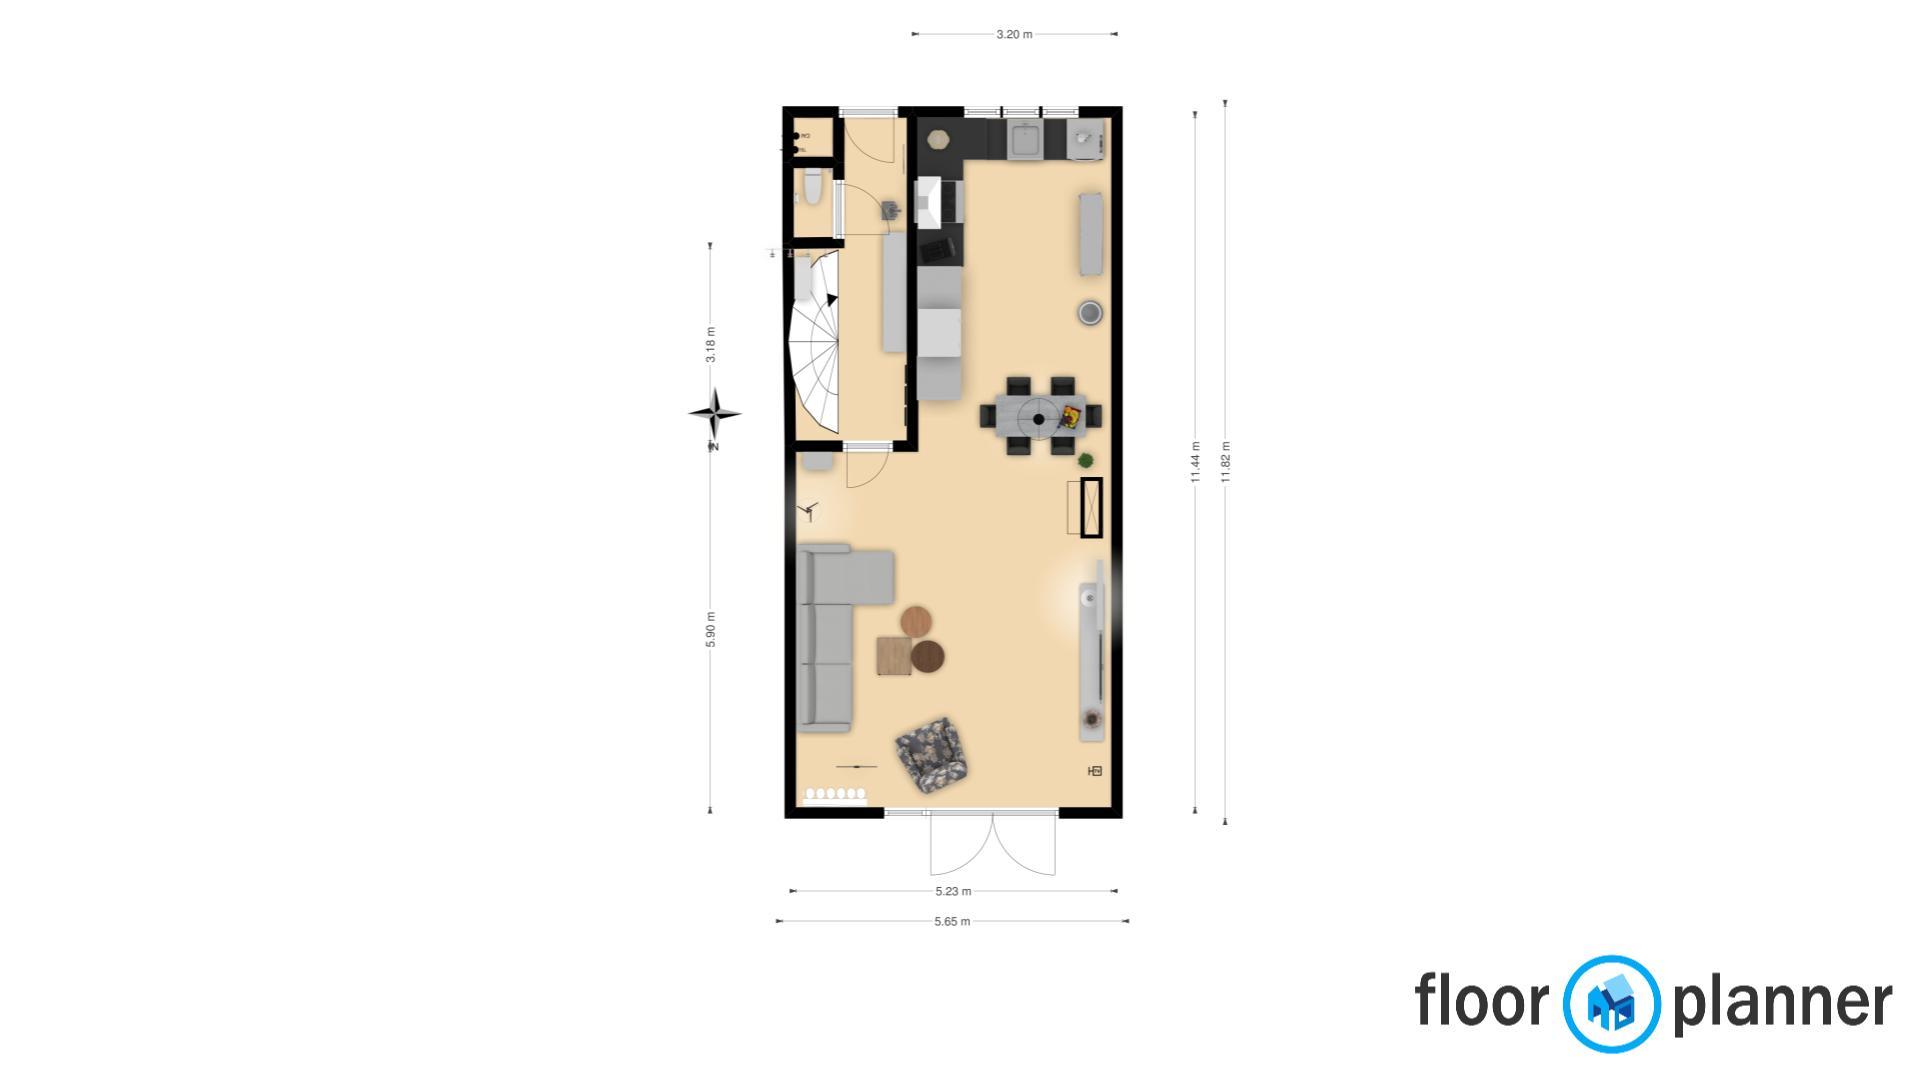 Woonkamer, keuken, hal, toilet